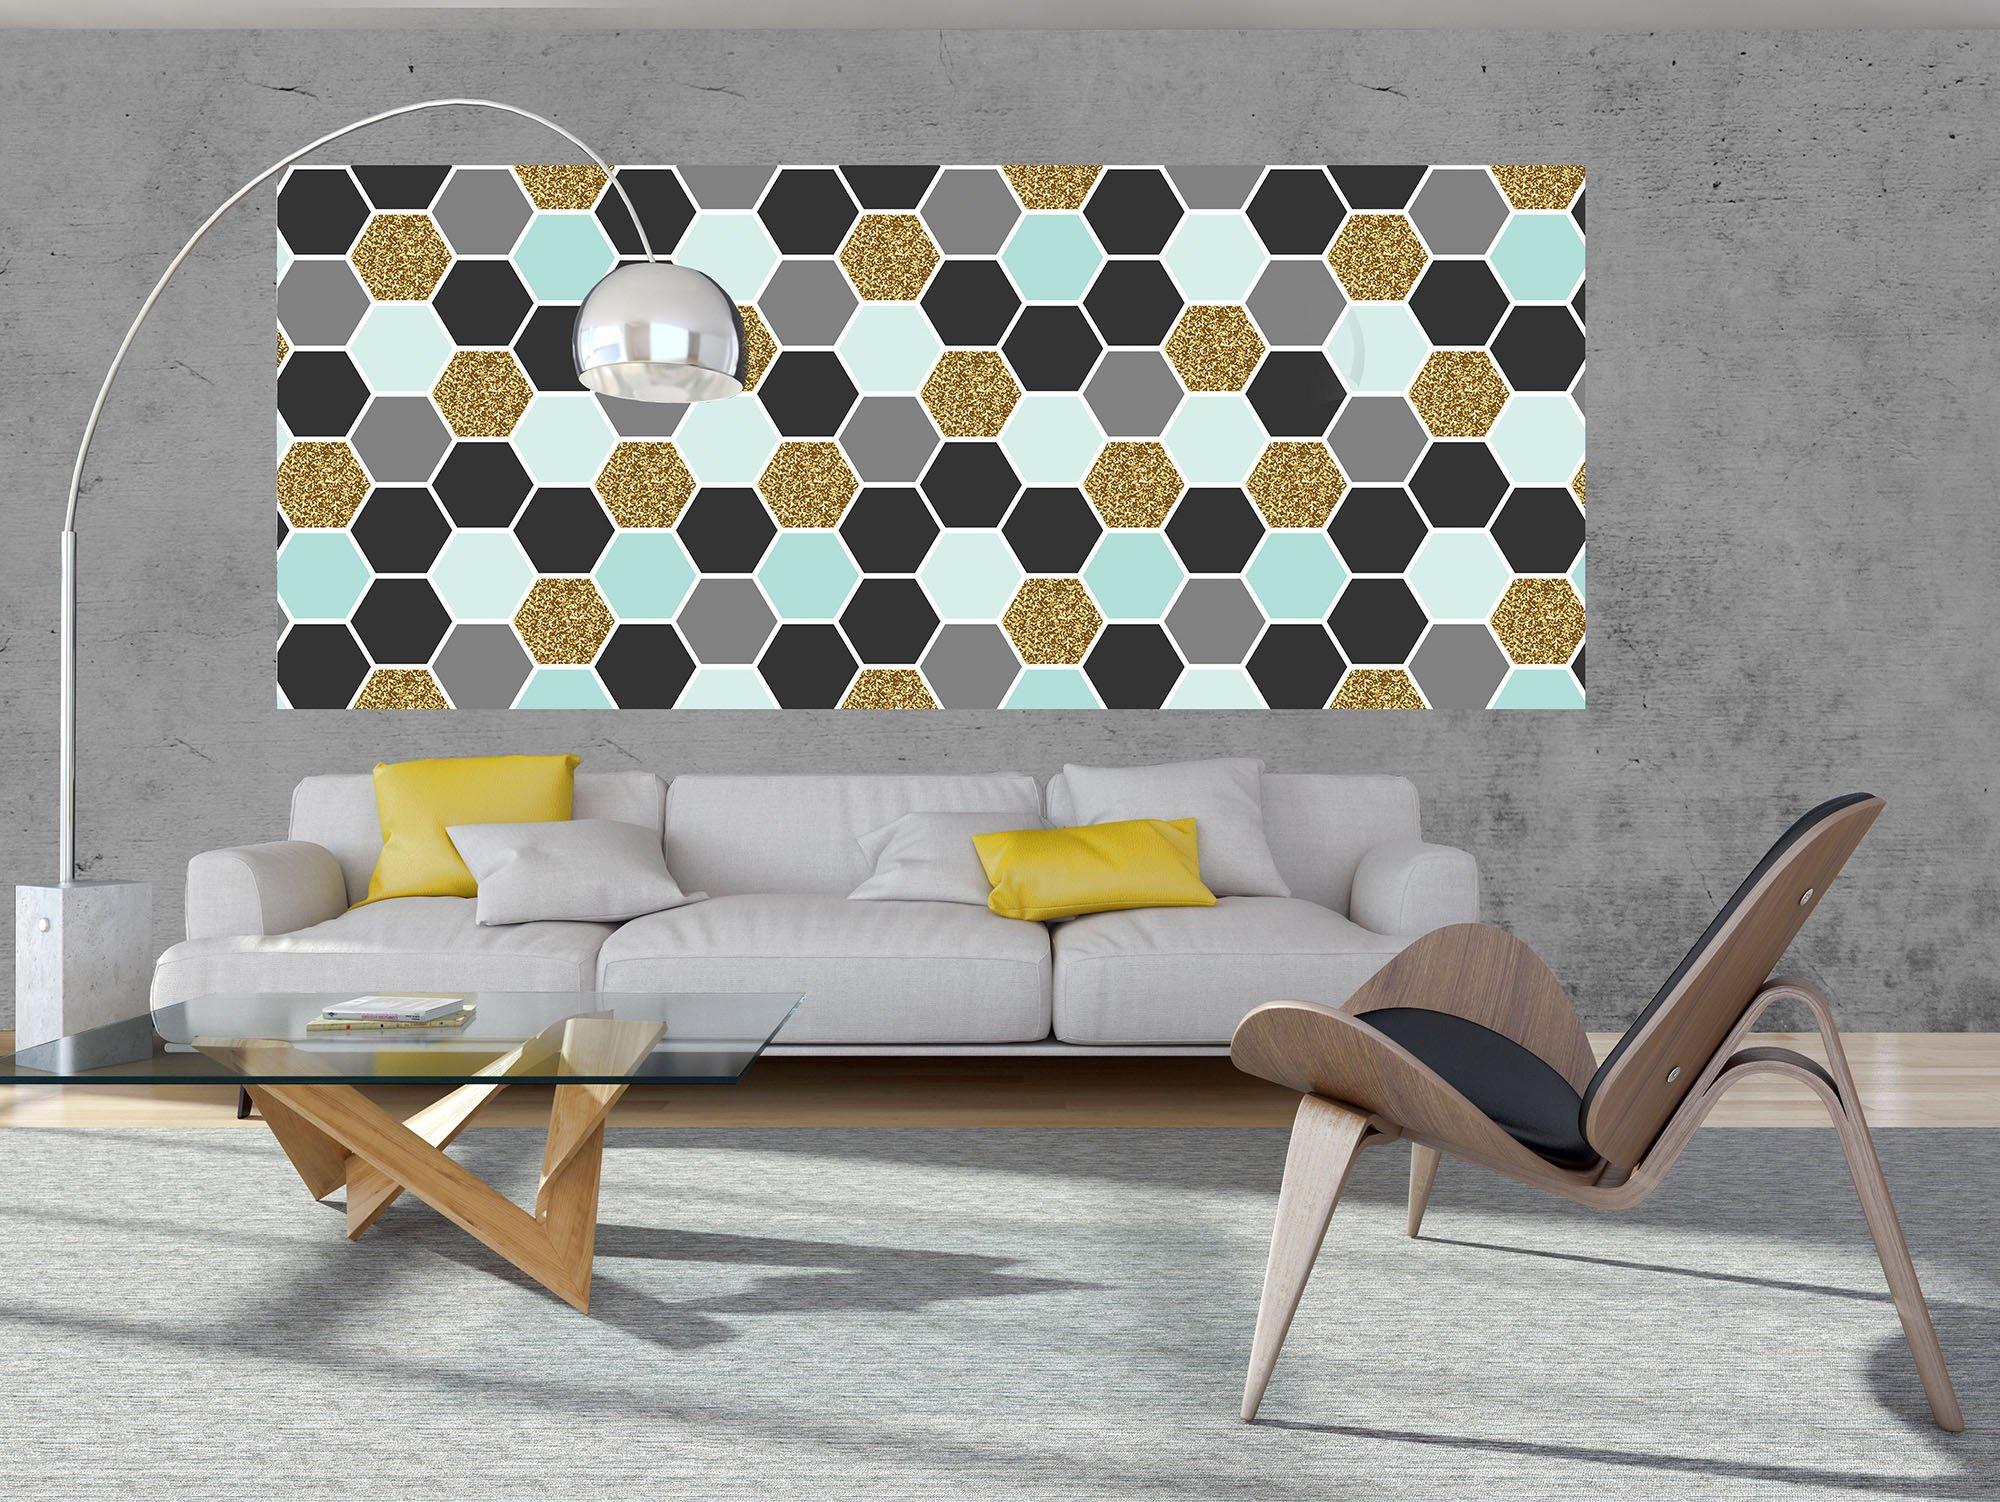 panorama fototapete mit abstrakten sechsecken. Black Bedroom Furniture Sets. Home Design Ideas